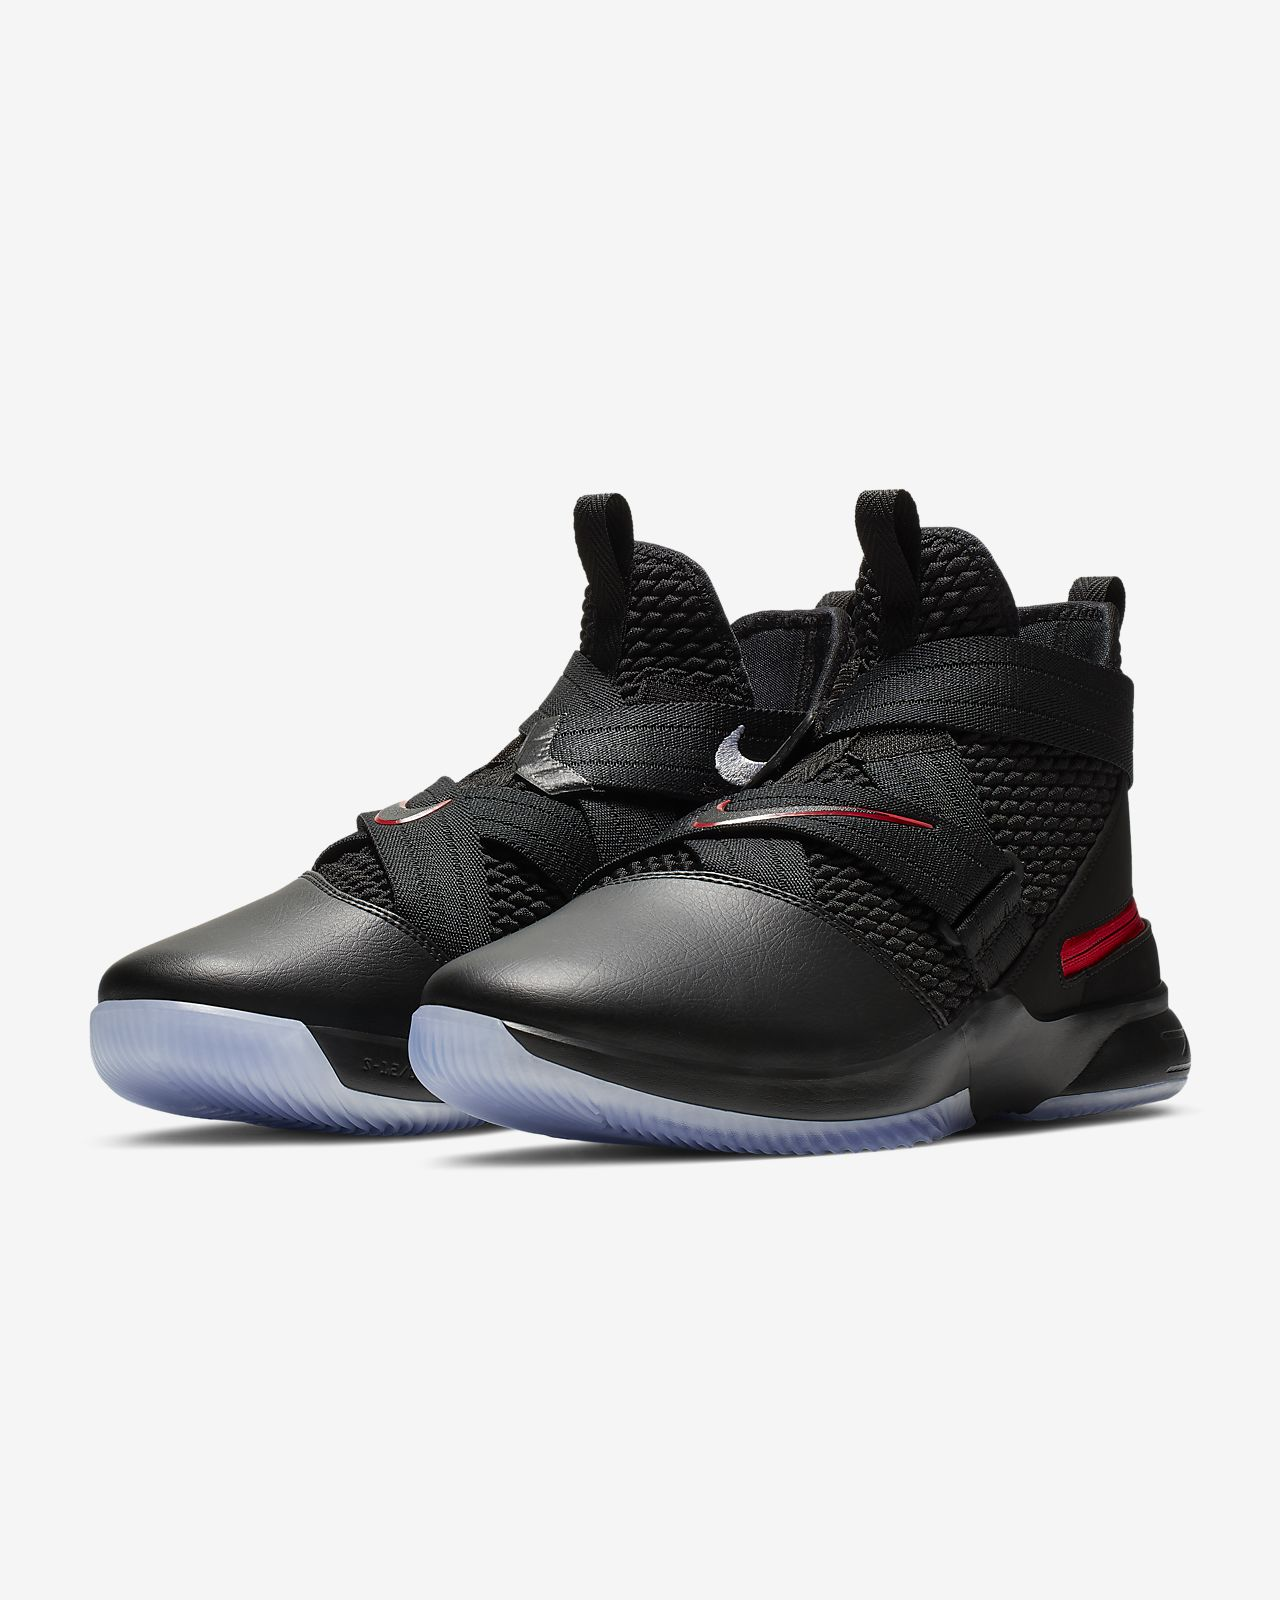 b495dd8a2edf3 LeBron Soldier 12 FlyEase (Extra-Wide) Men s Basketball Shoe. Nike.com